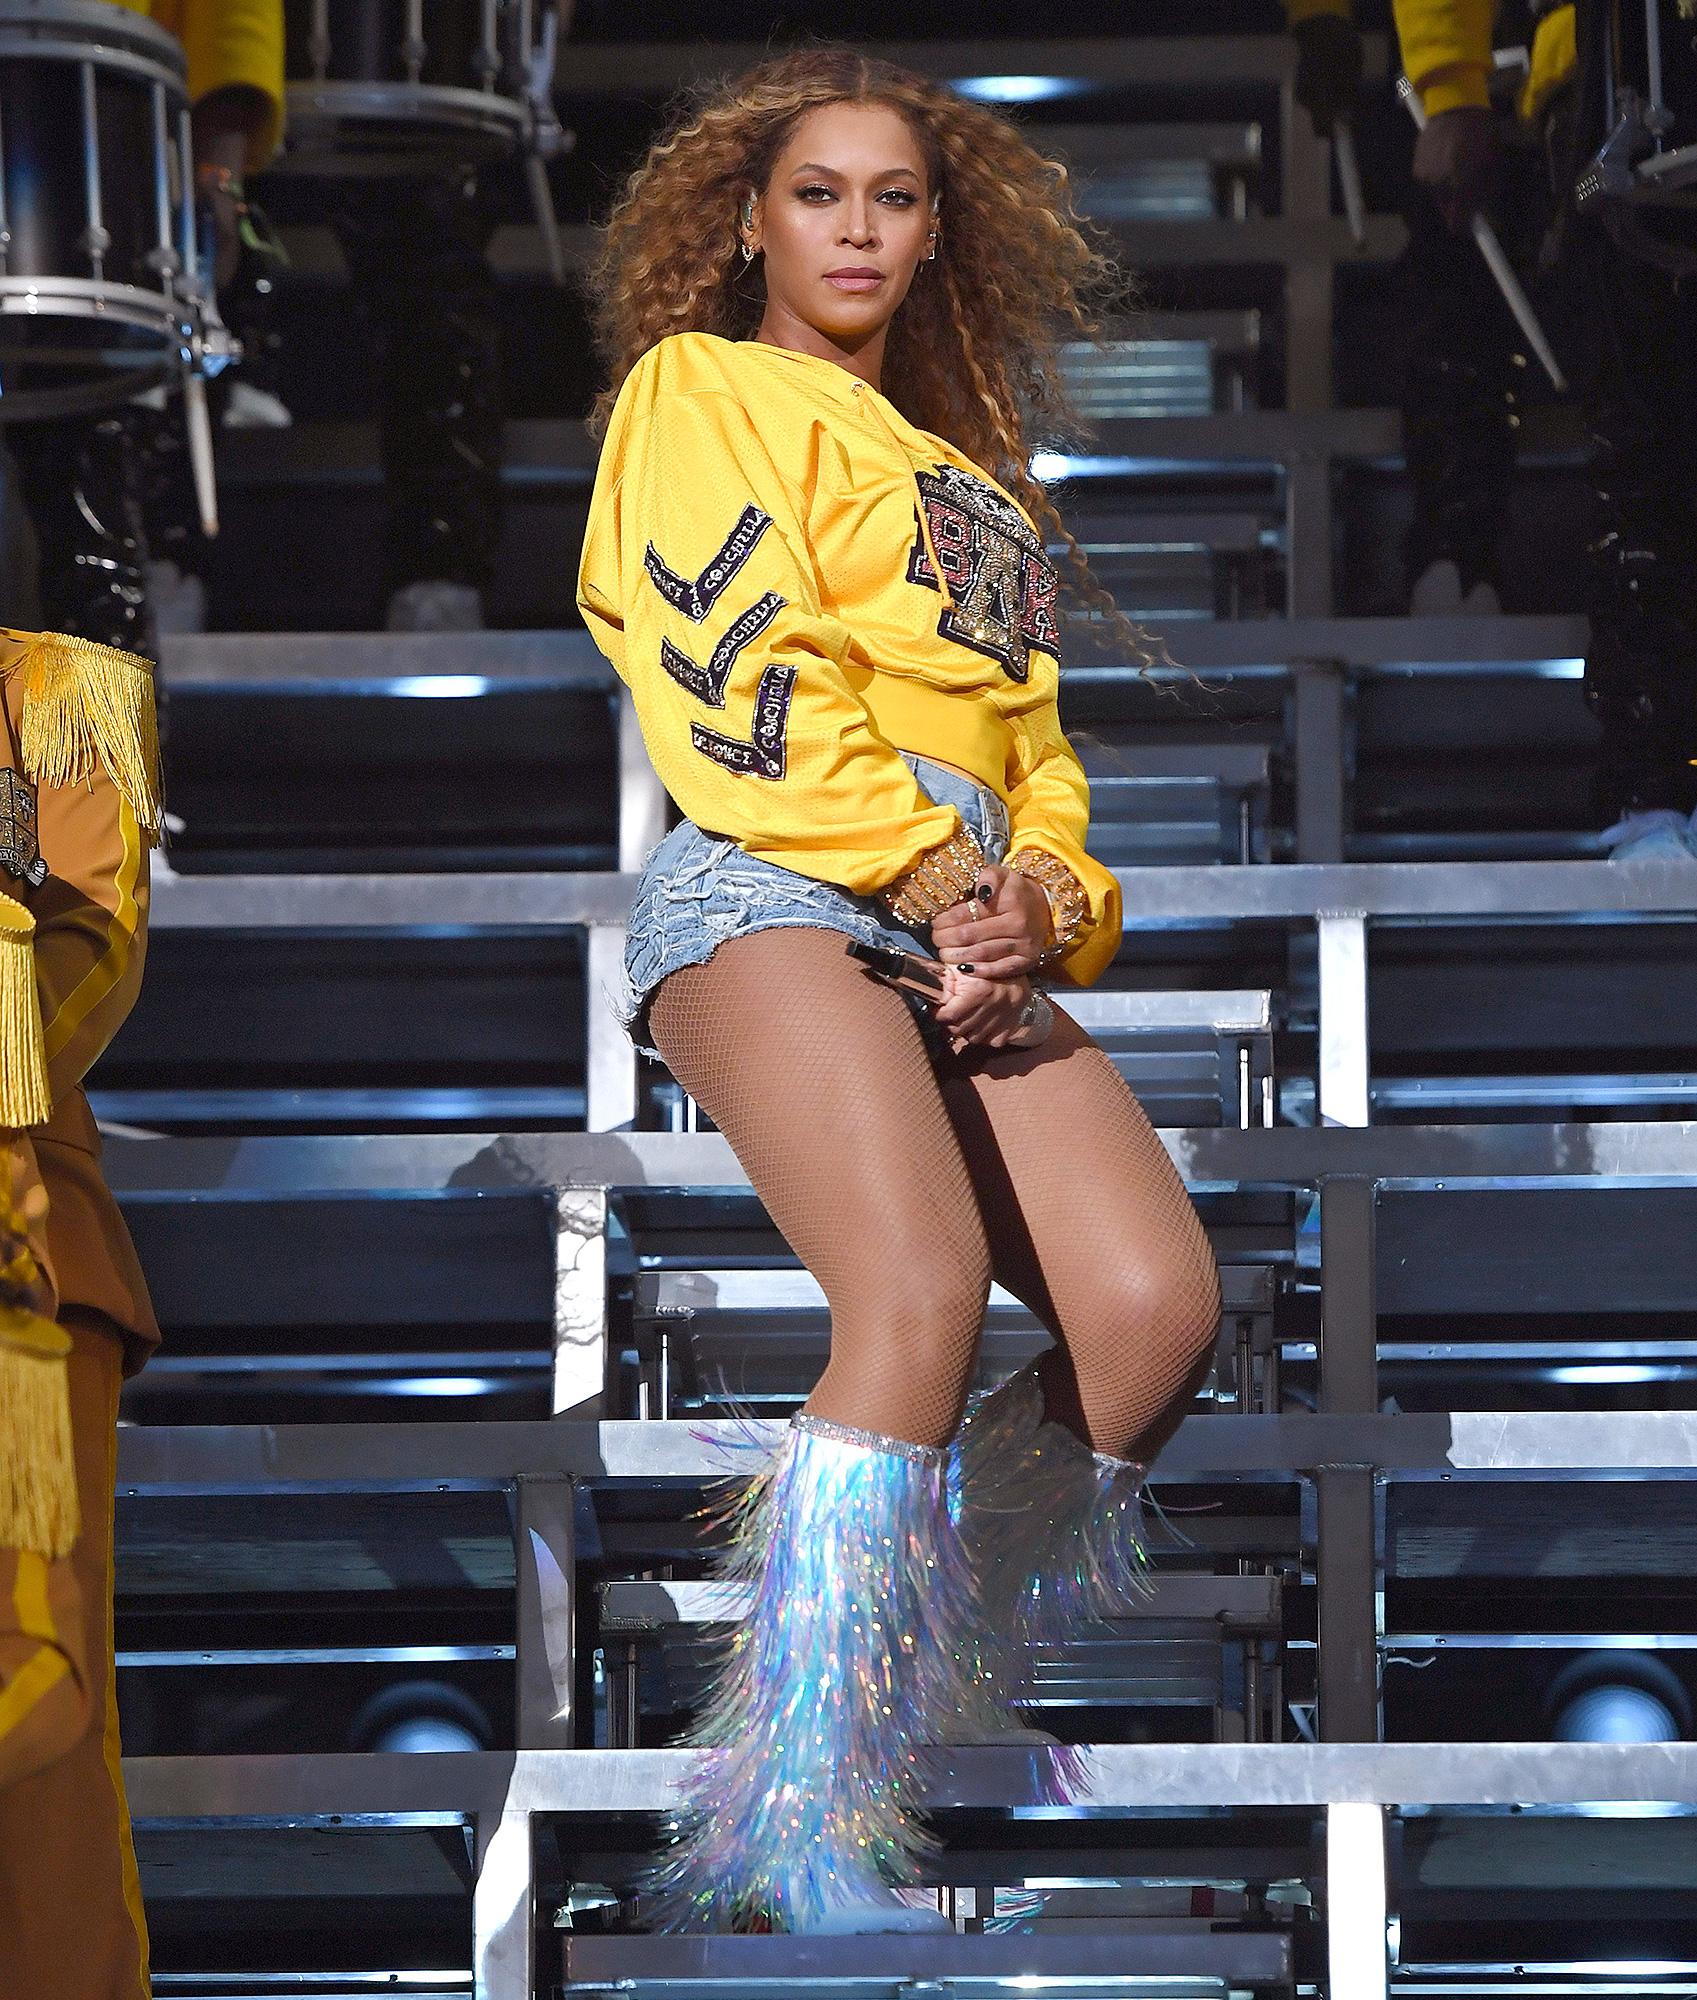 Coachella 2018: Why did Beyonce make history? Destiny's Child singer hosts reunion